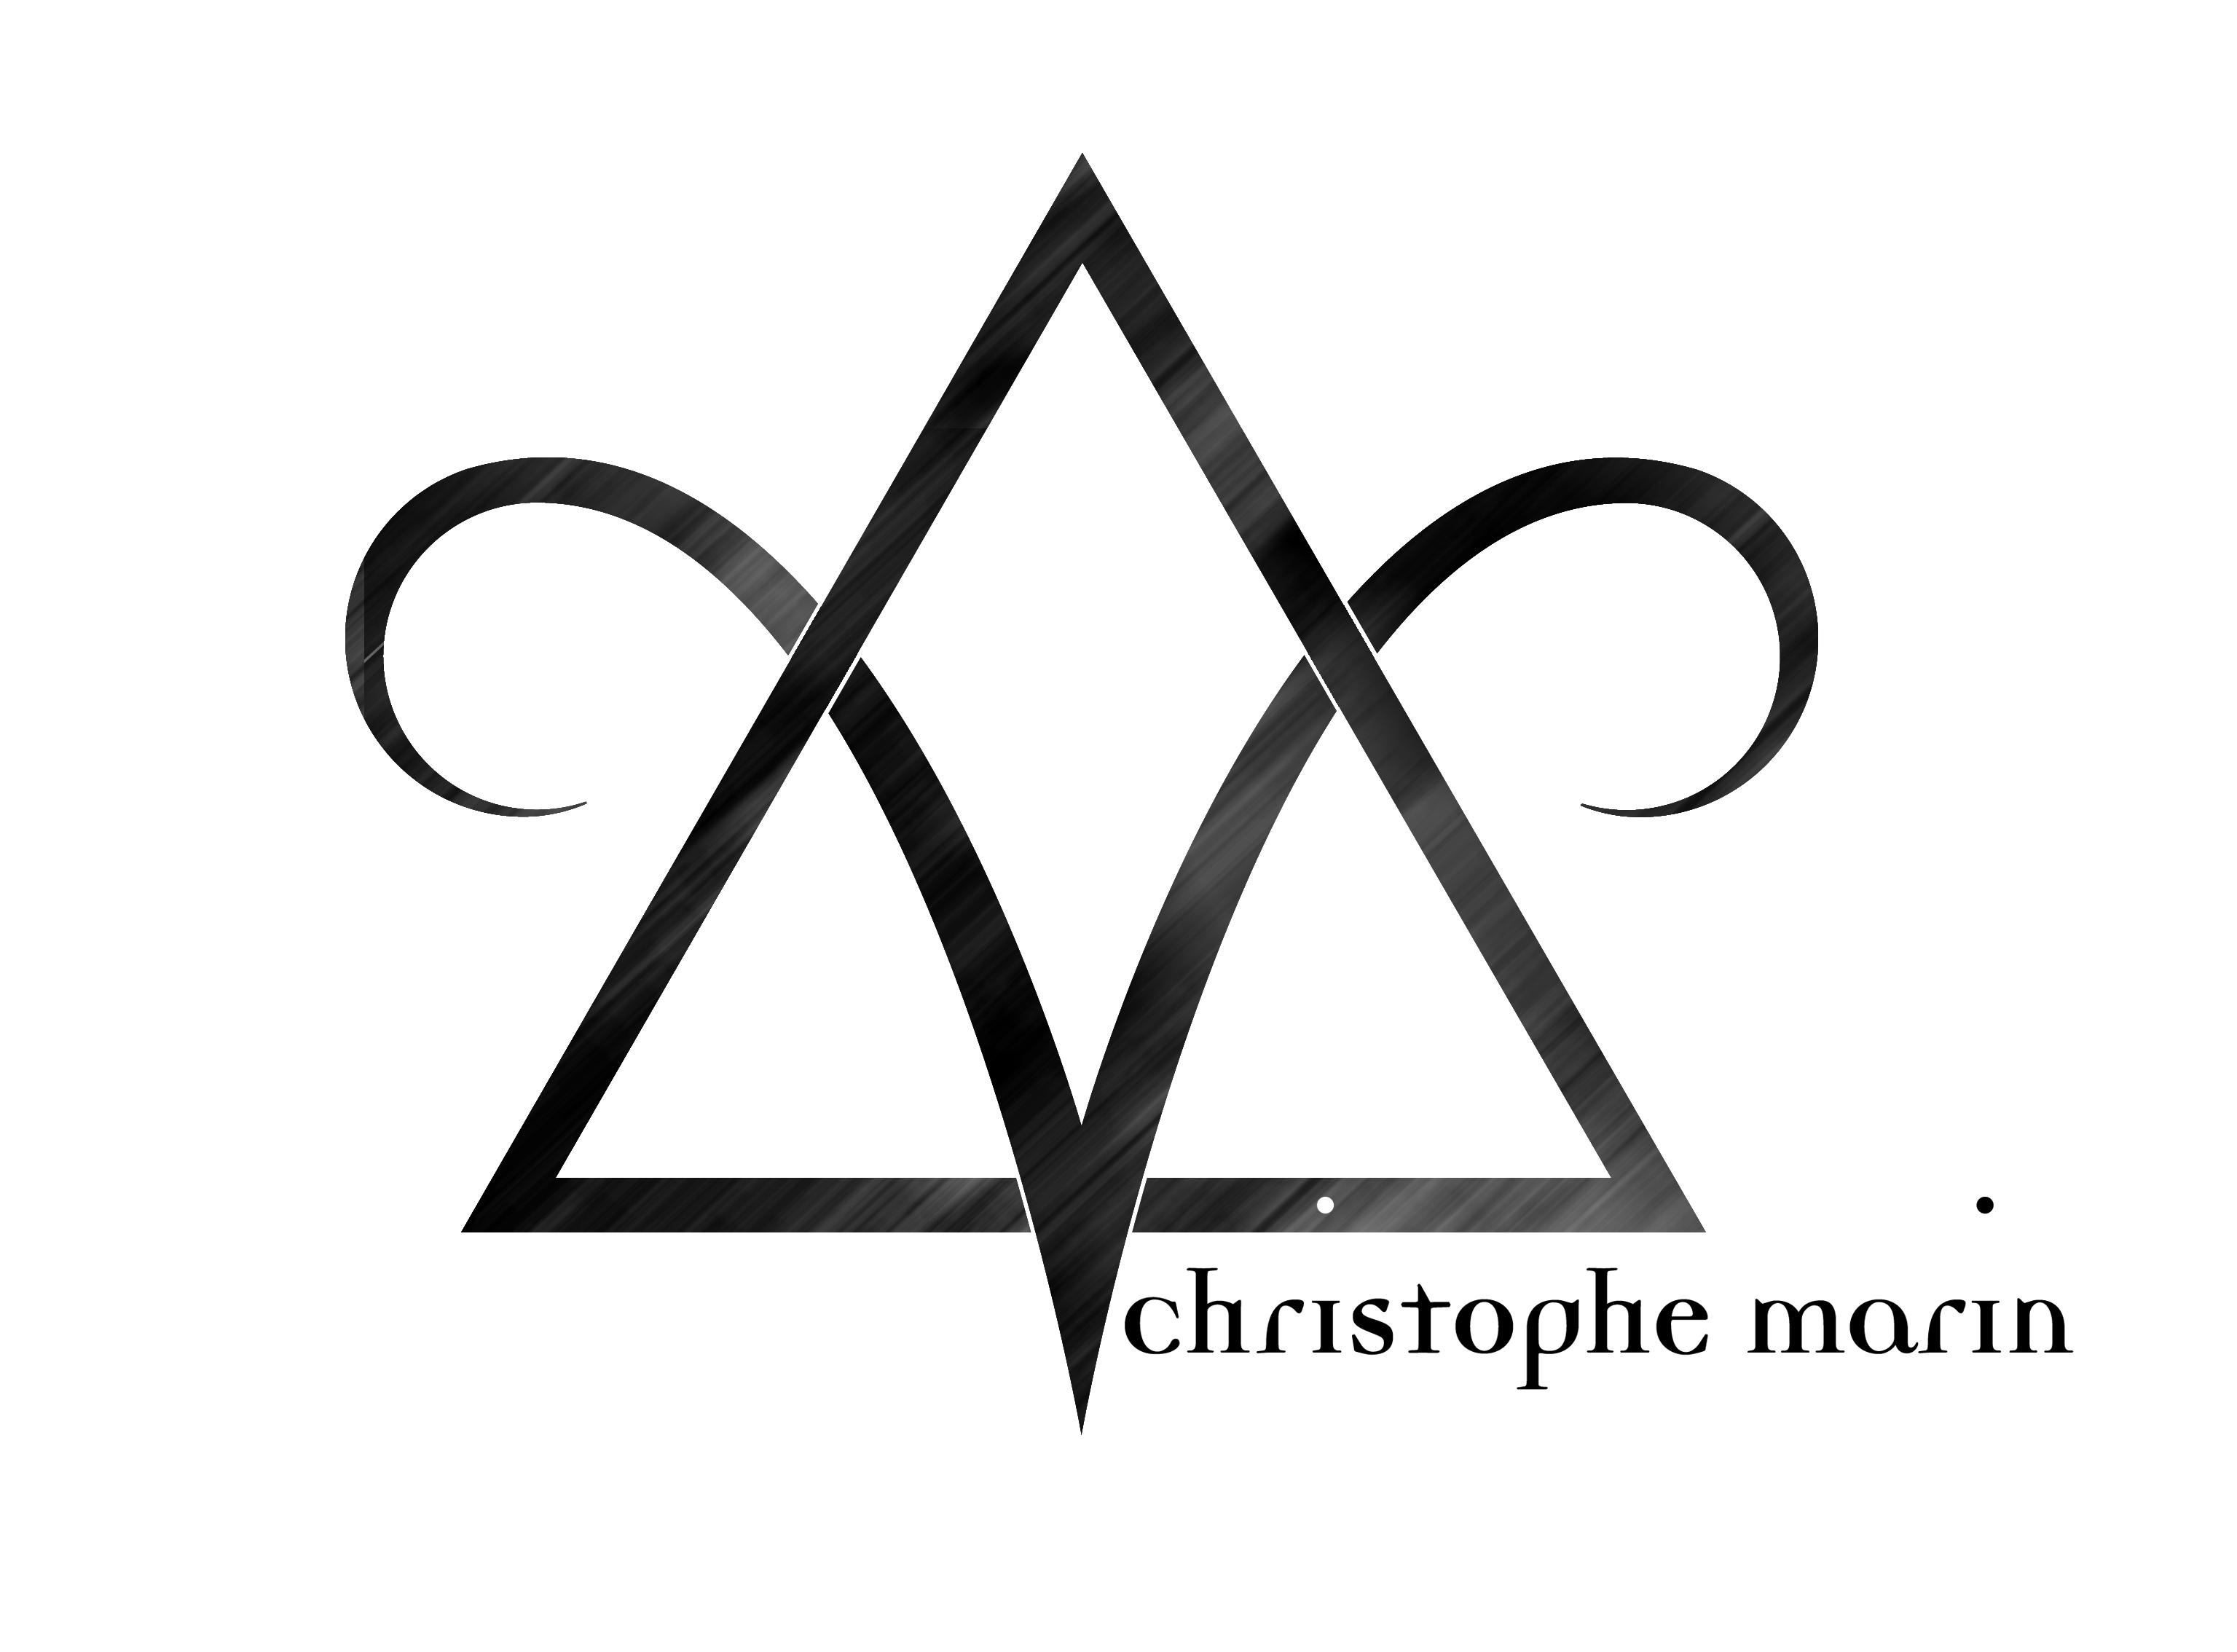 CHRISTOPHE MARIN FERRONNIER